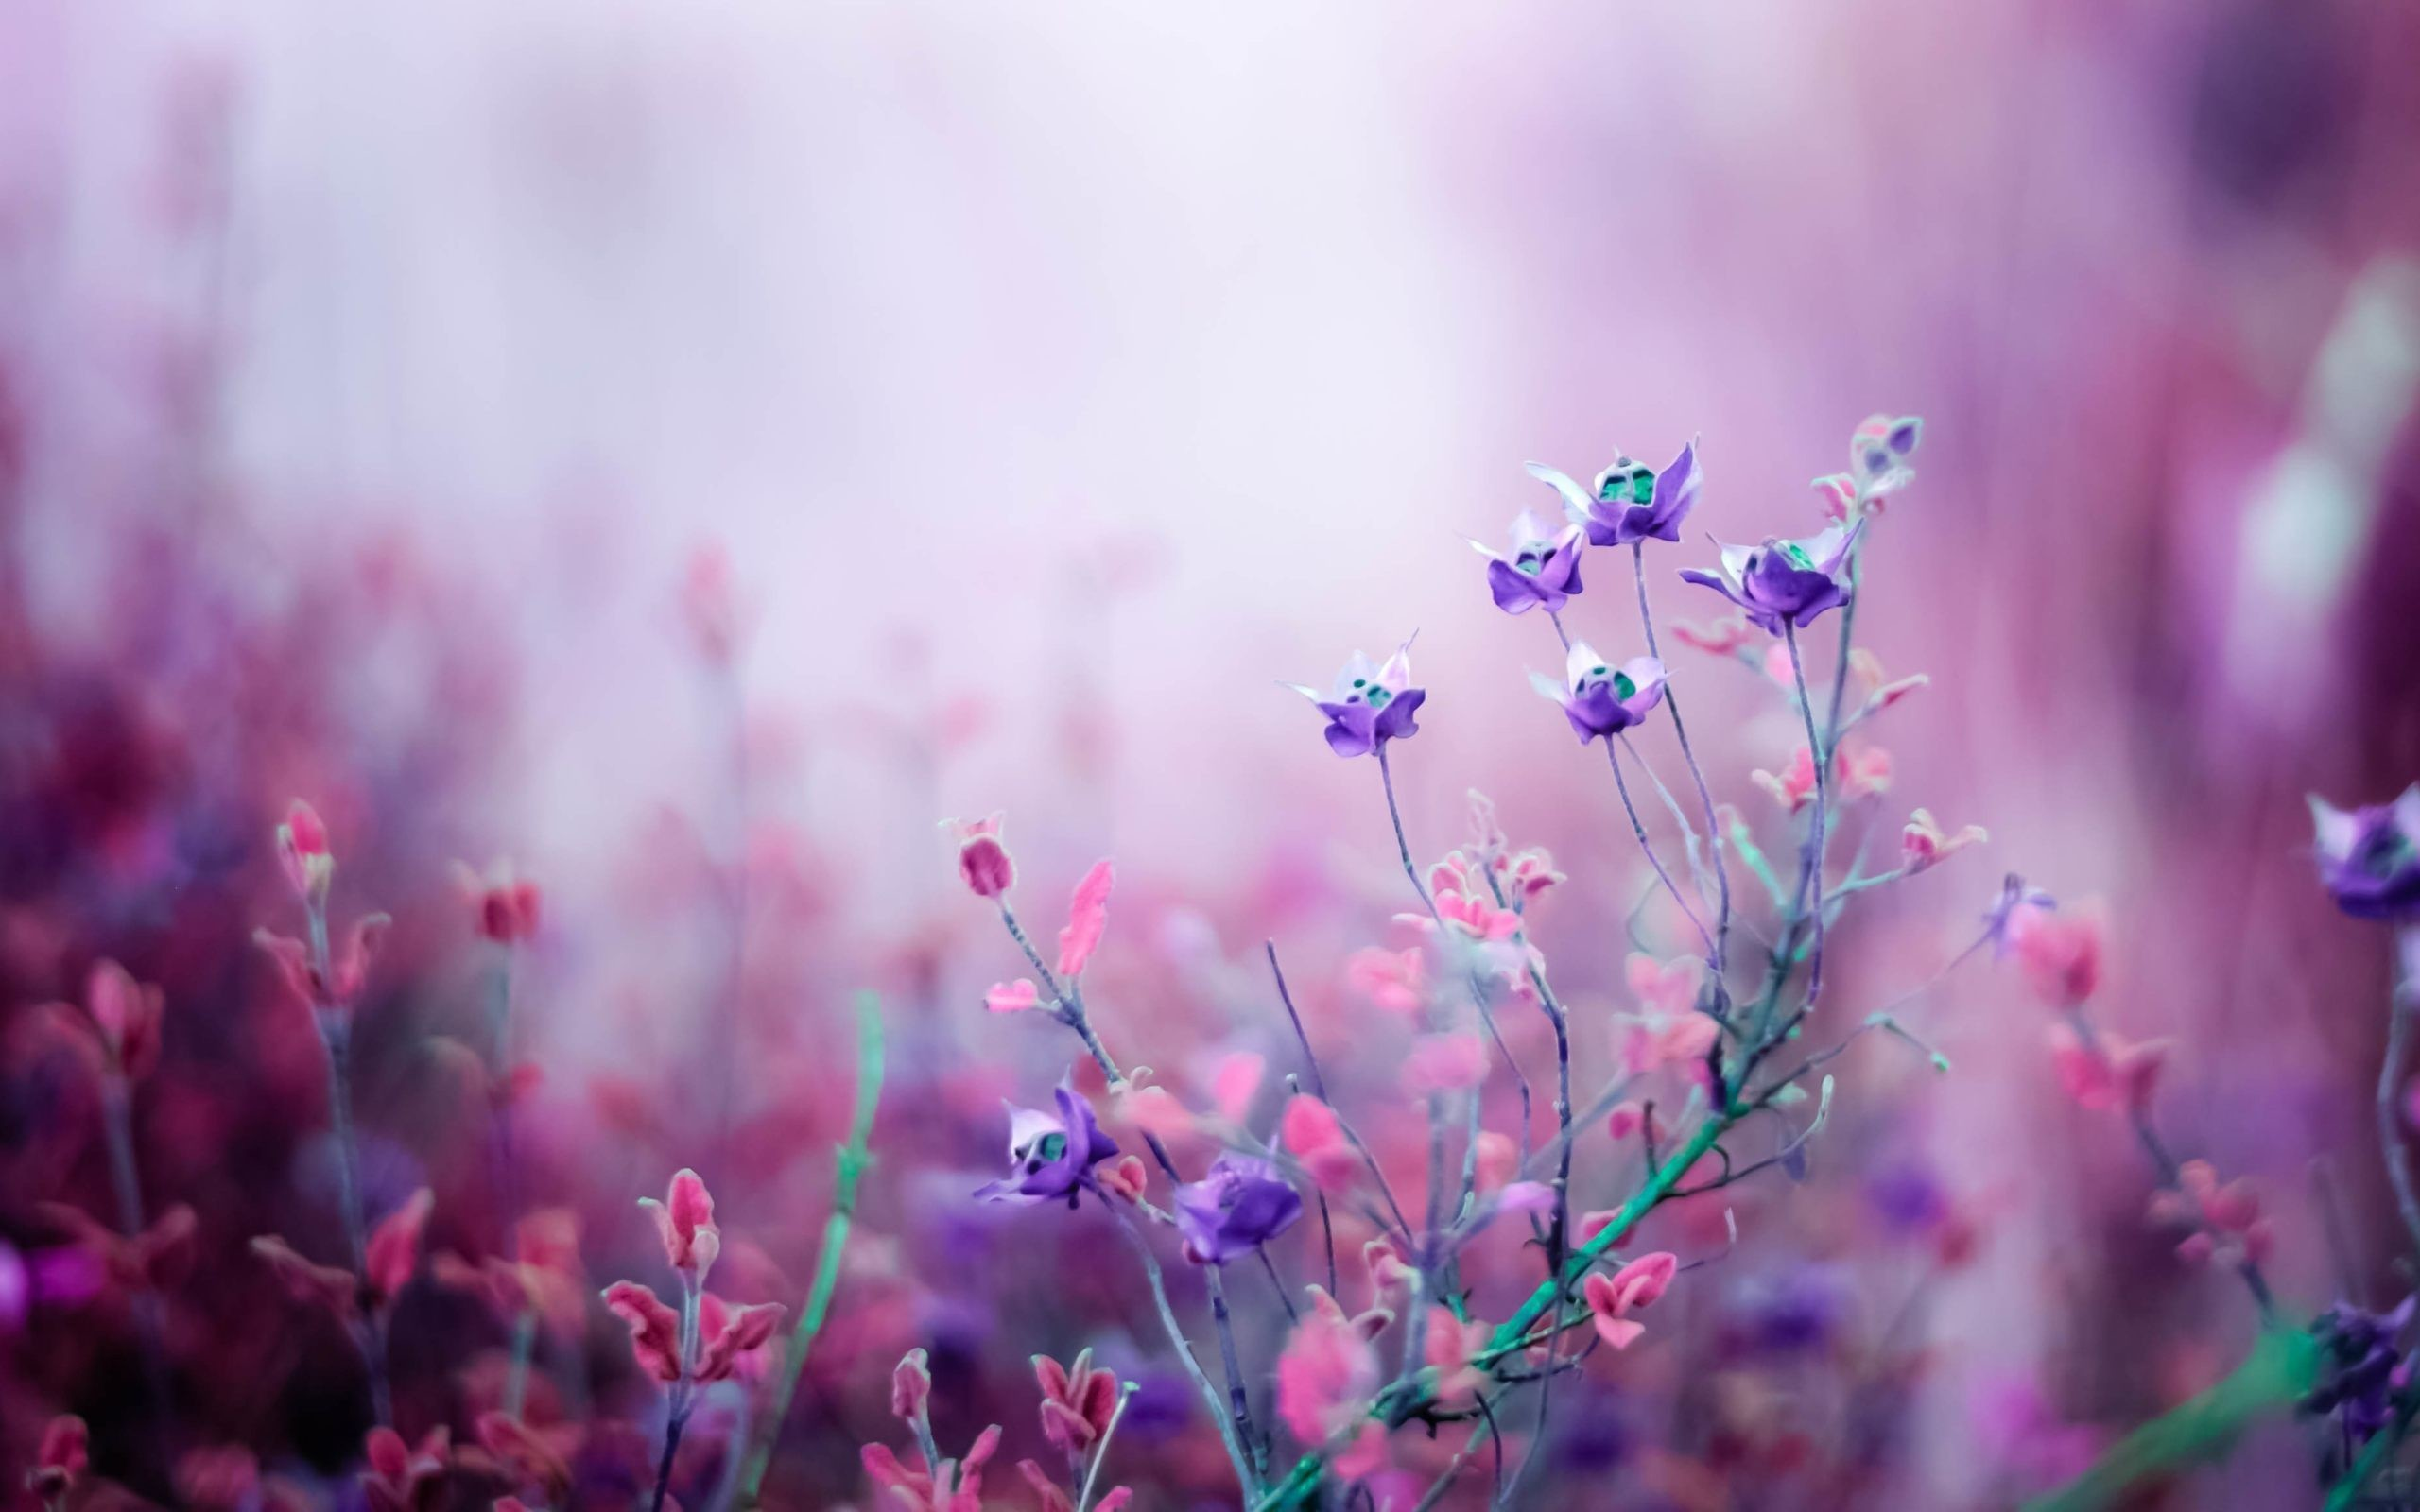 Pink and purple desktop wallpaper wallpapersafari – Free Pink Flower  Wallpaper Wallpapersafari. Download